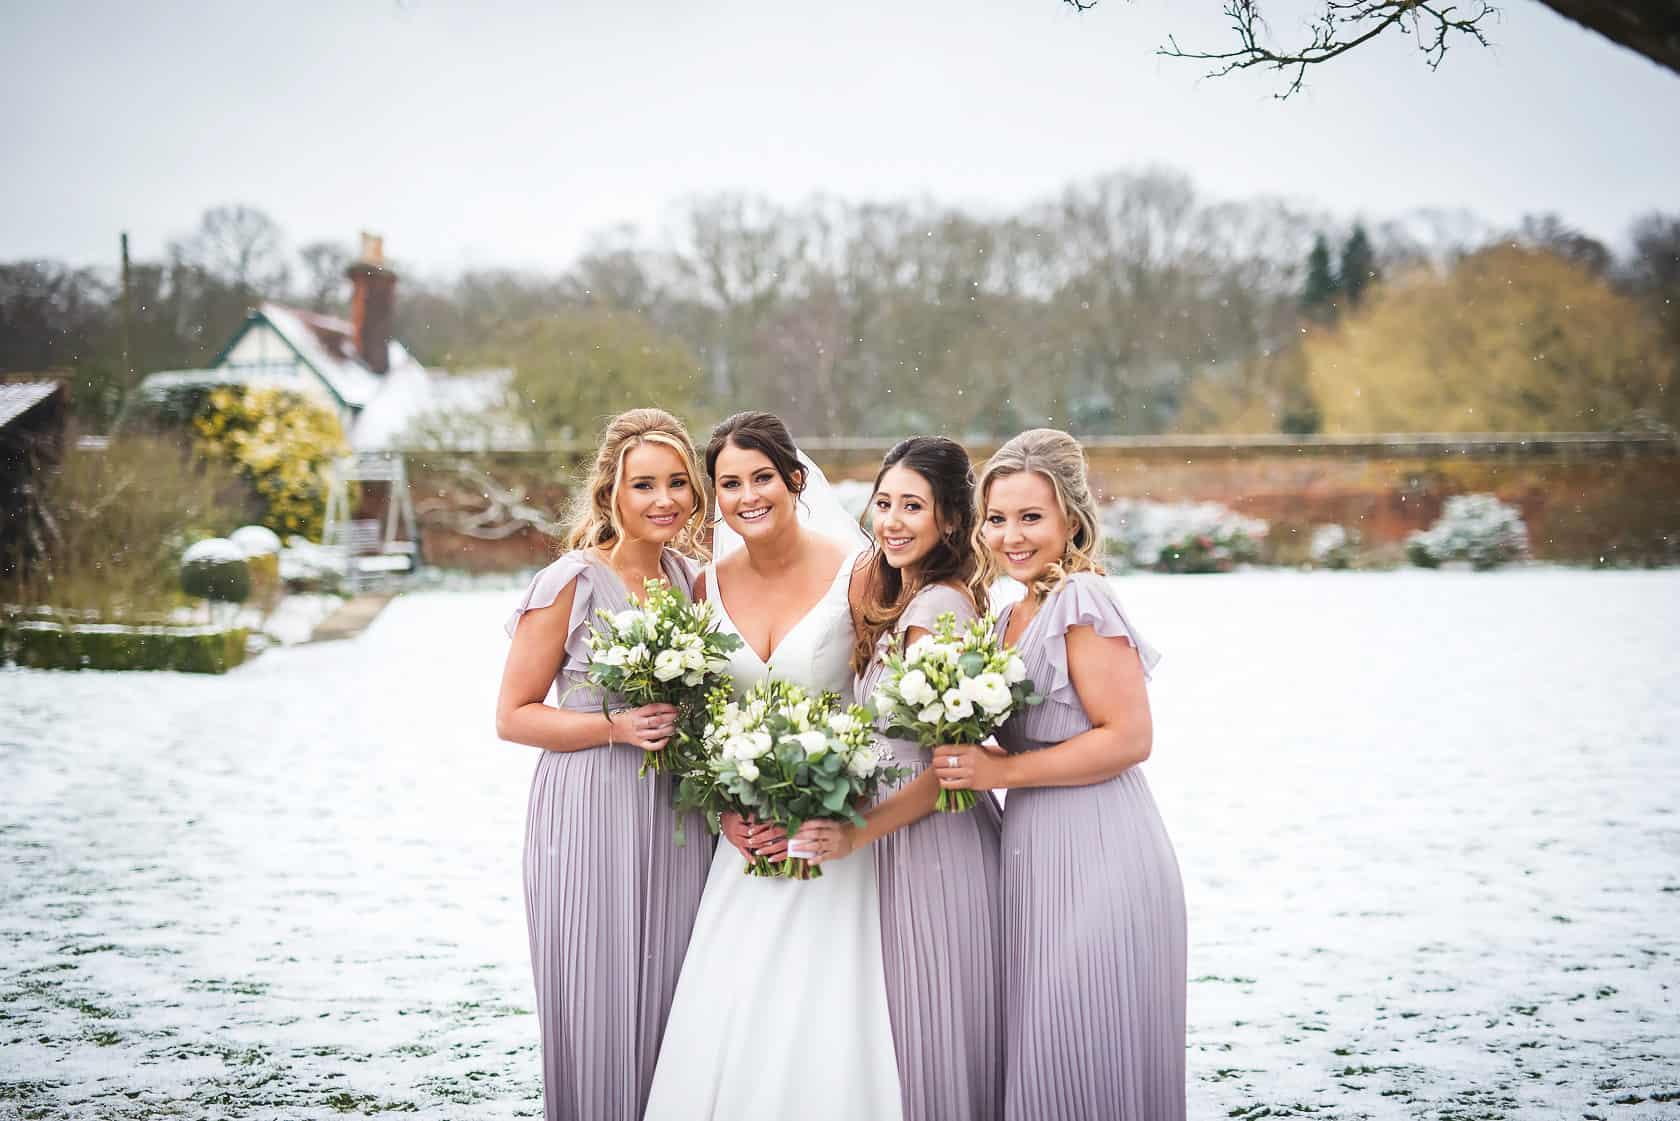 Best_Wedding_Photography_2018_Wedding-Photographer-Essex-and-London_033